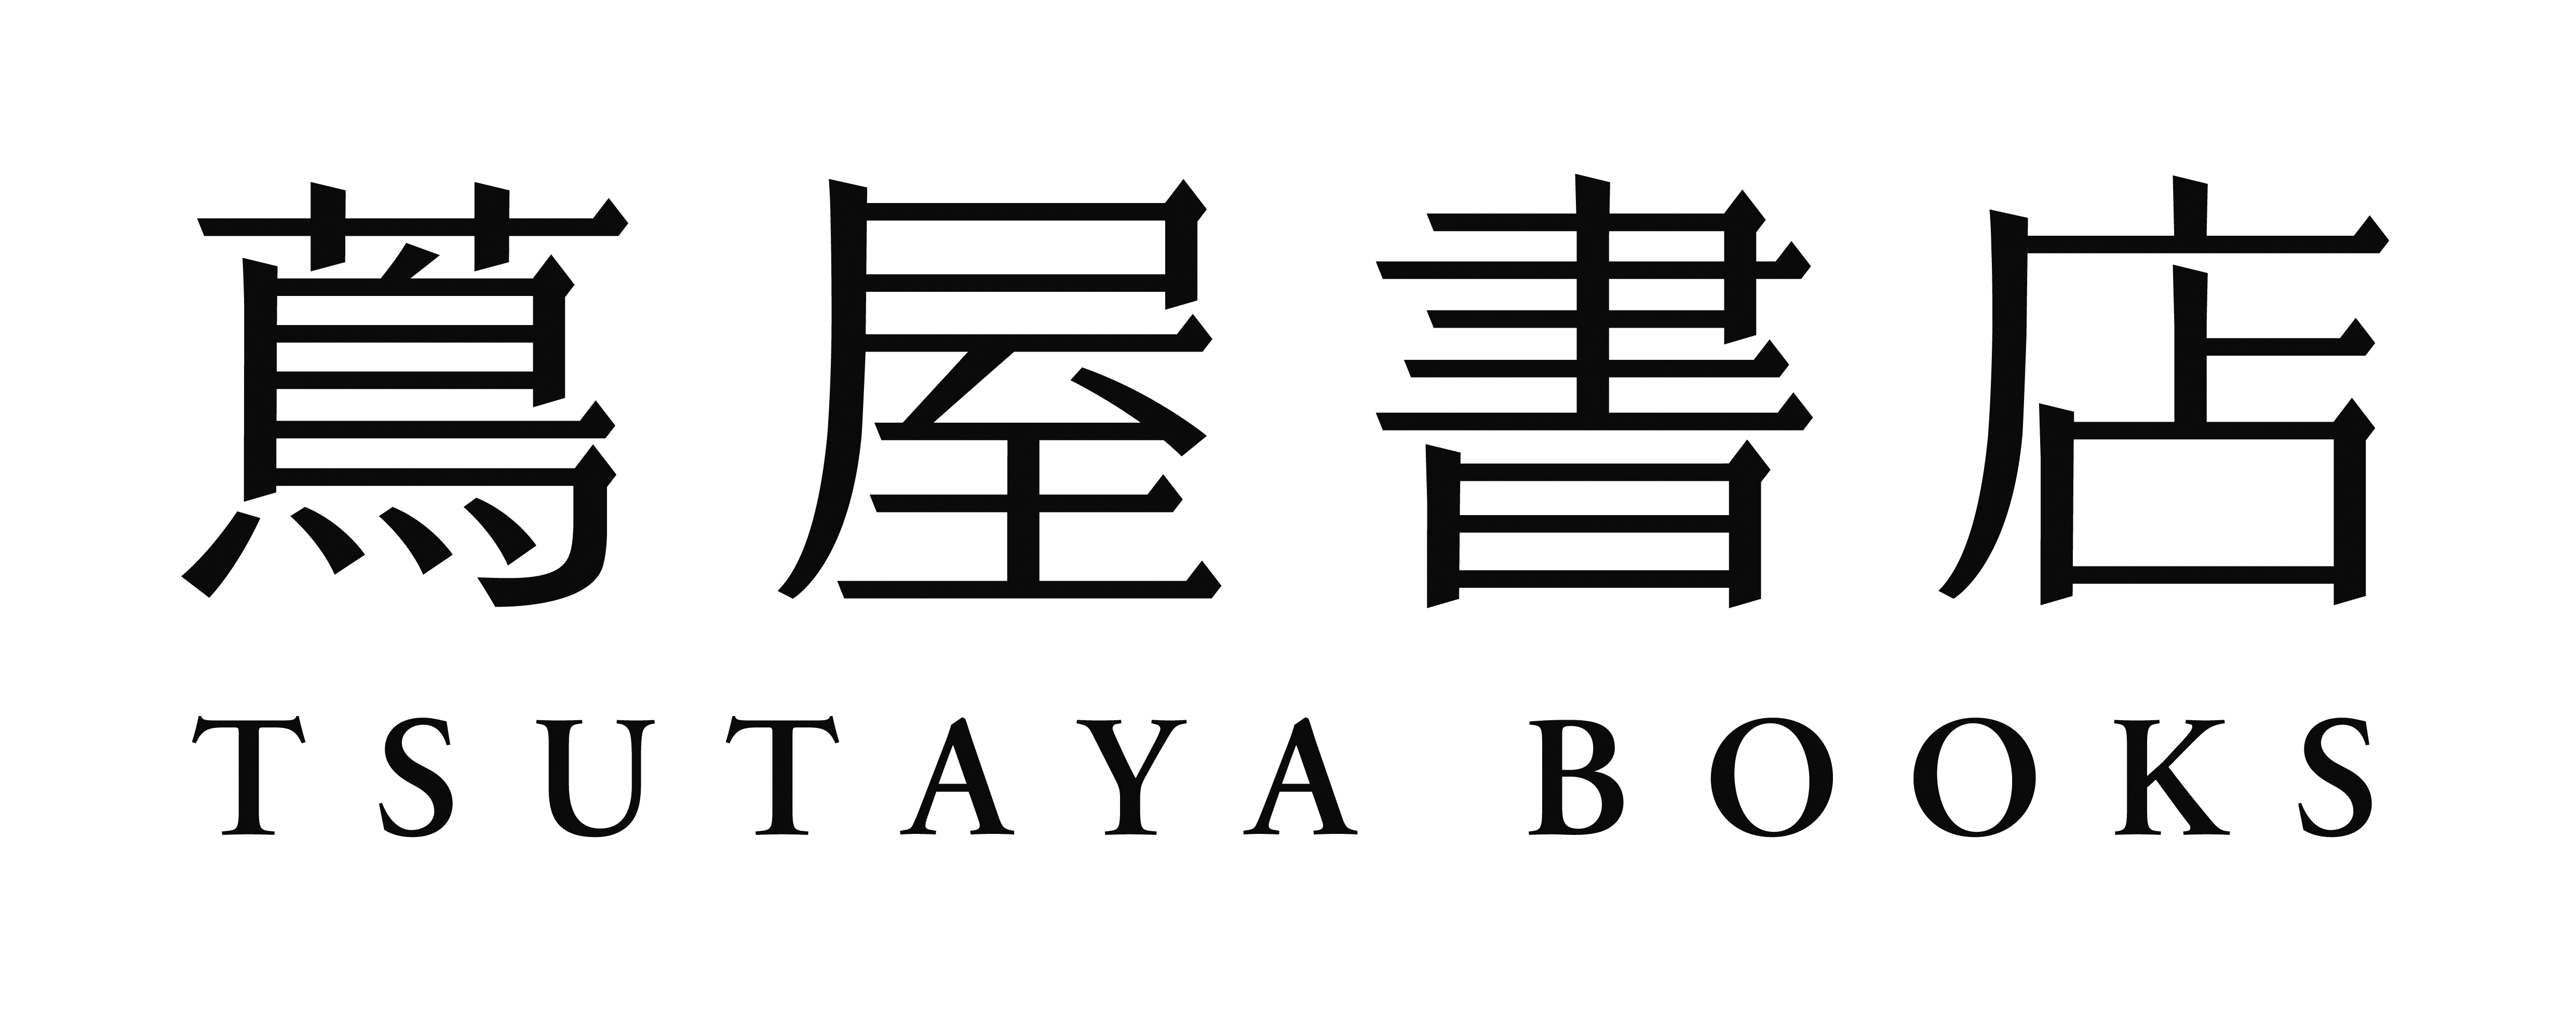 茑屋投资(上海)有限公司书店企划运营担当(店舗企画コンサルタント)日企招聘信息